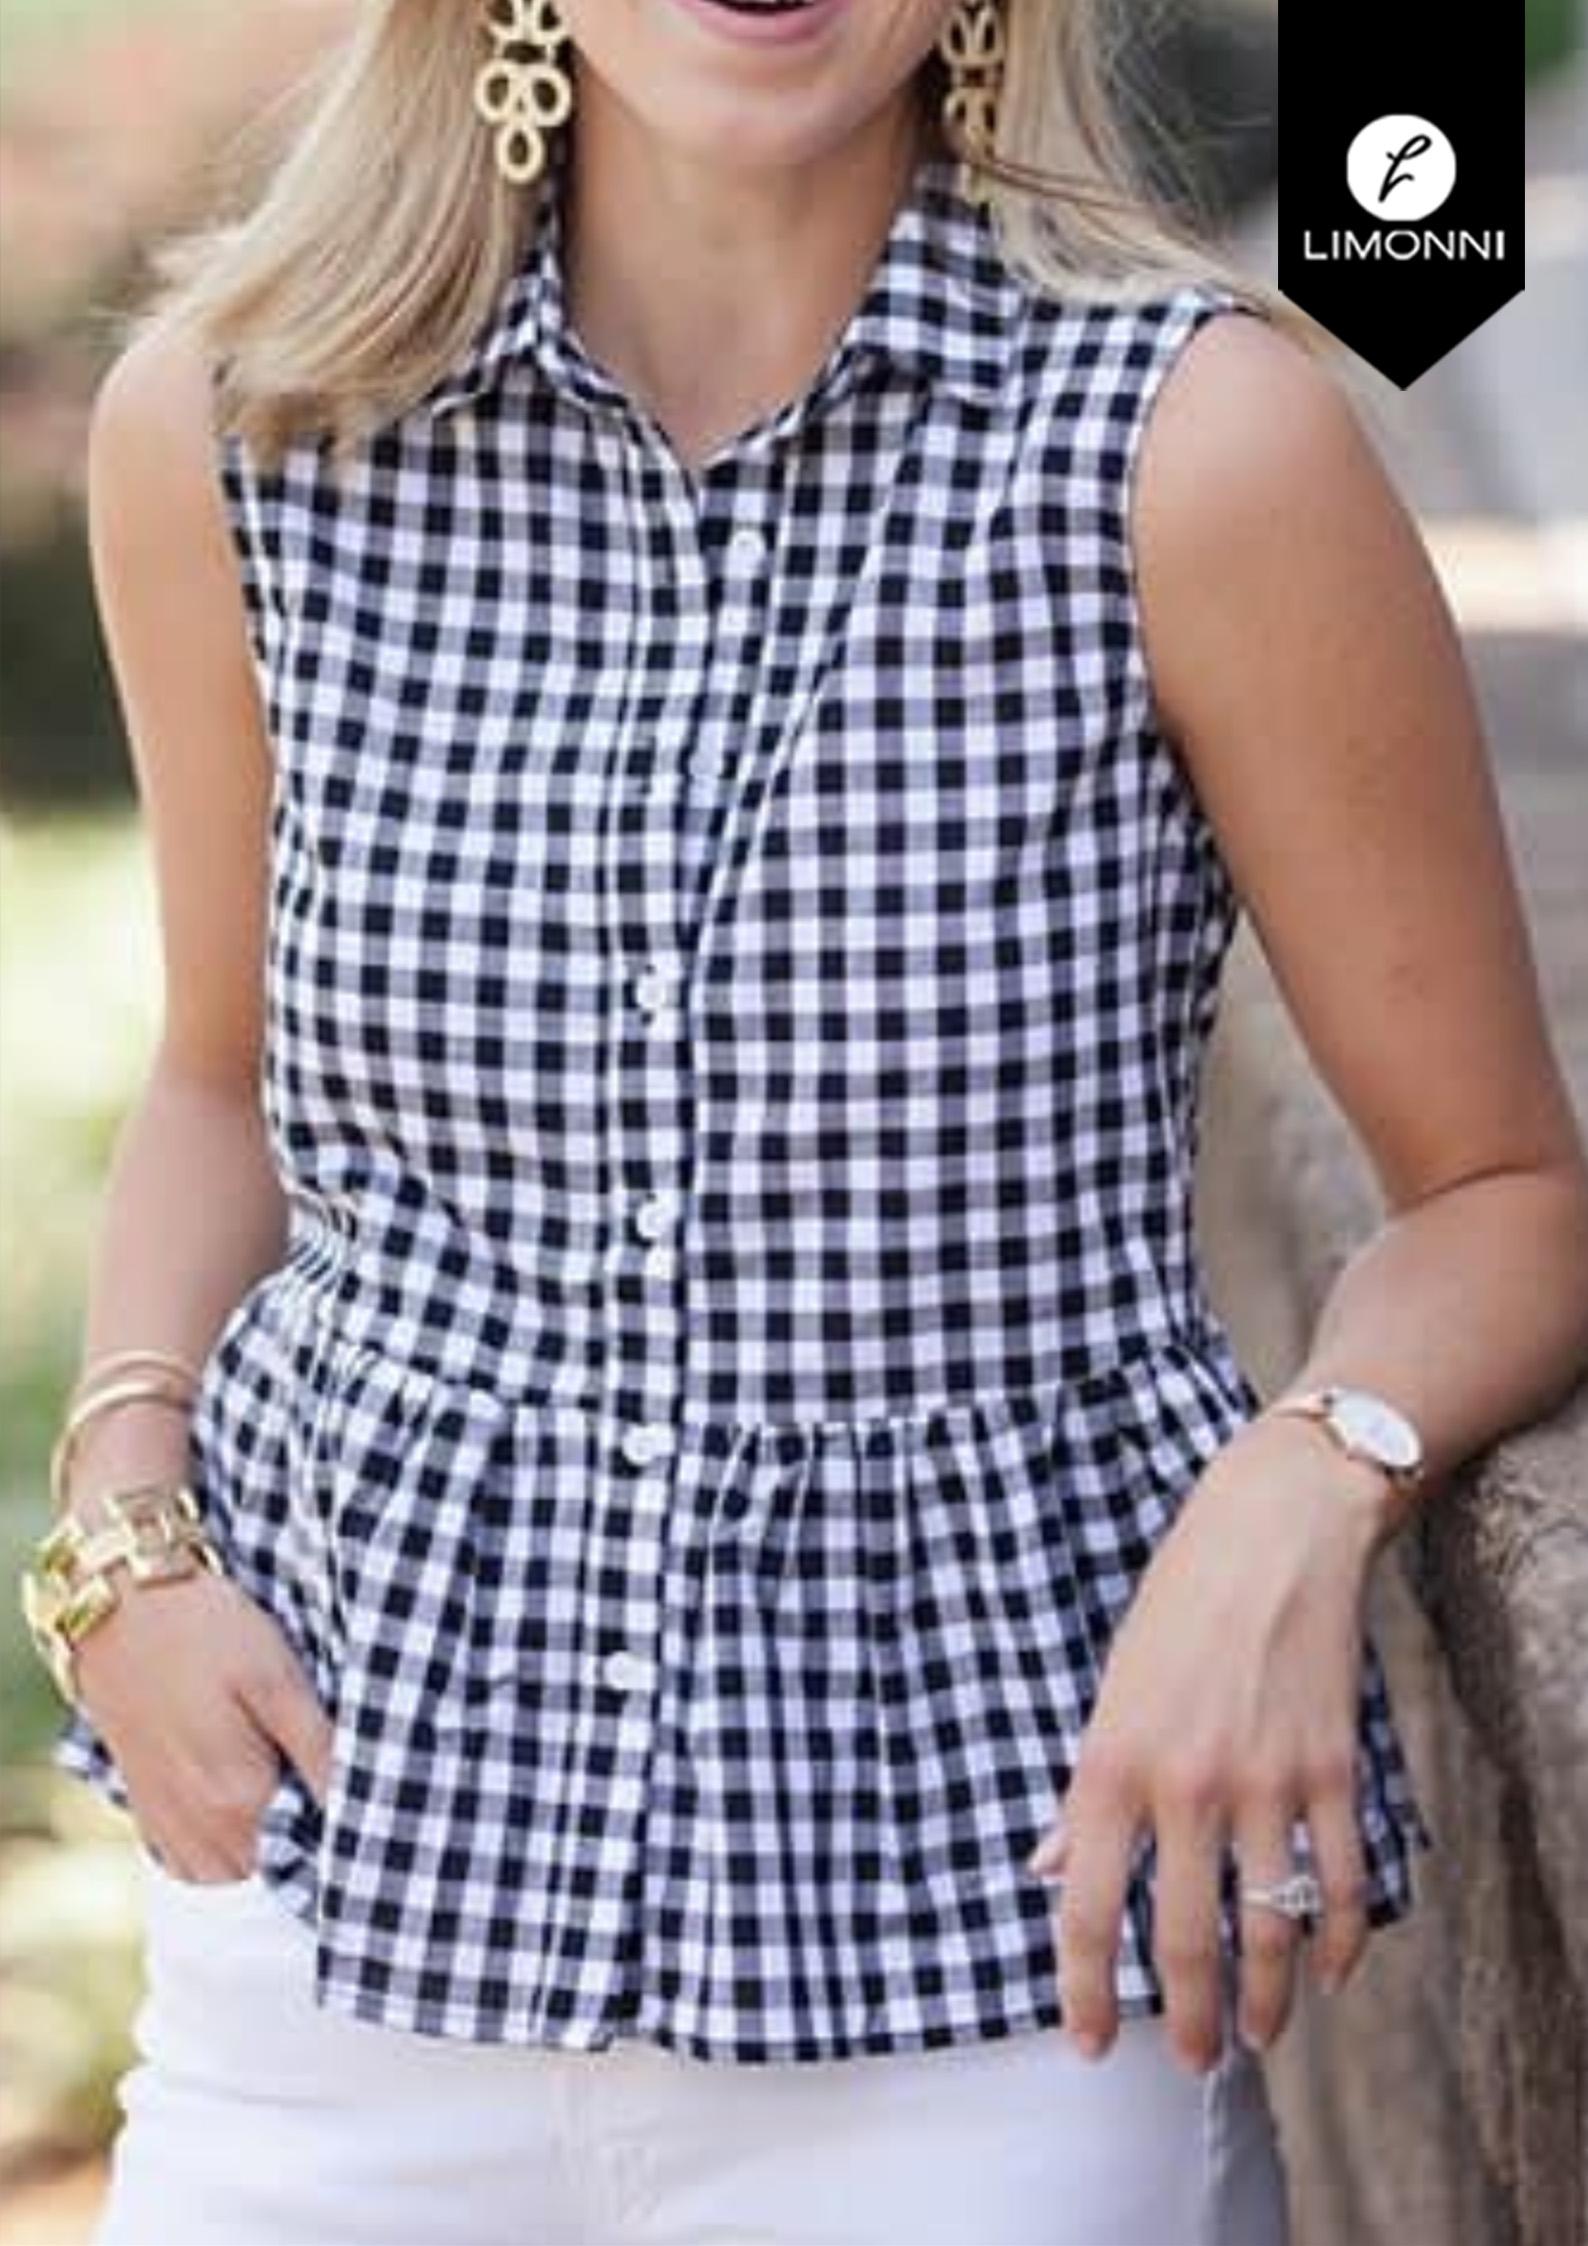 Blusas para mujer Limonni Bennett LI1293 Camiseras